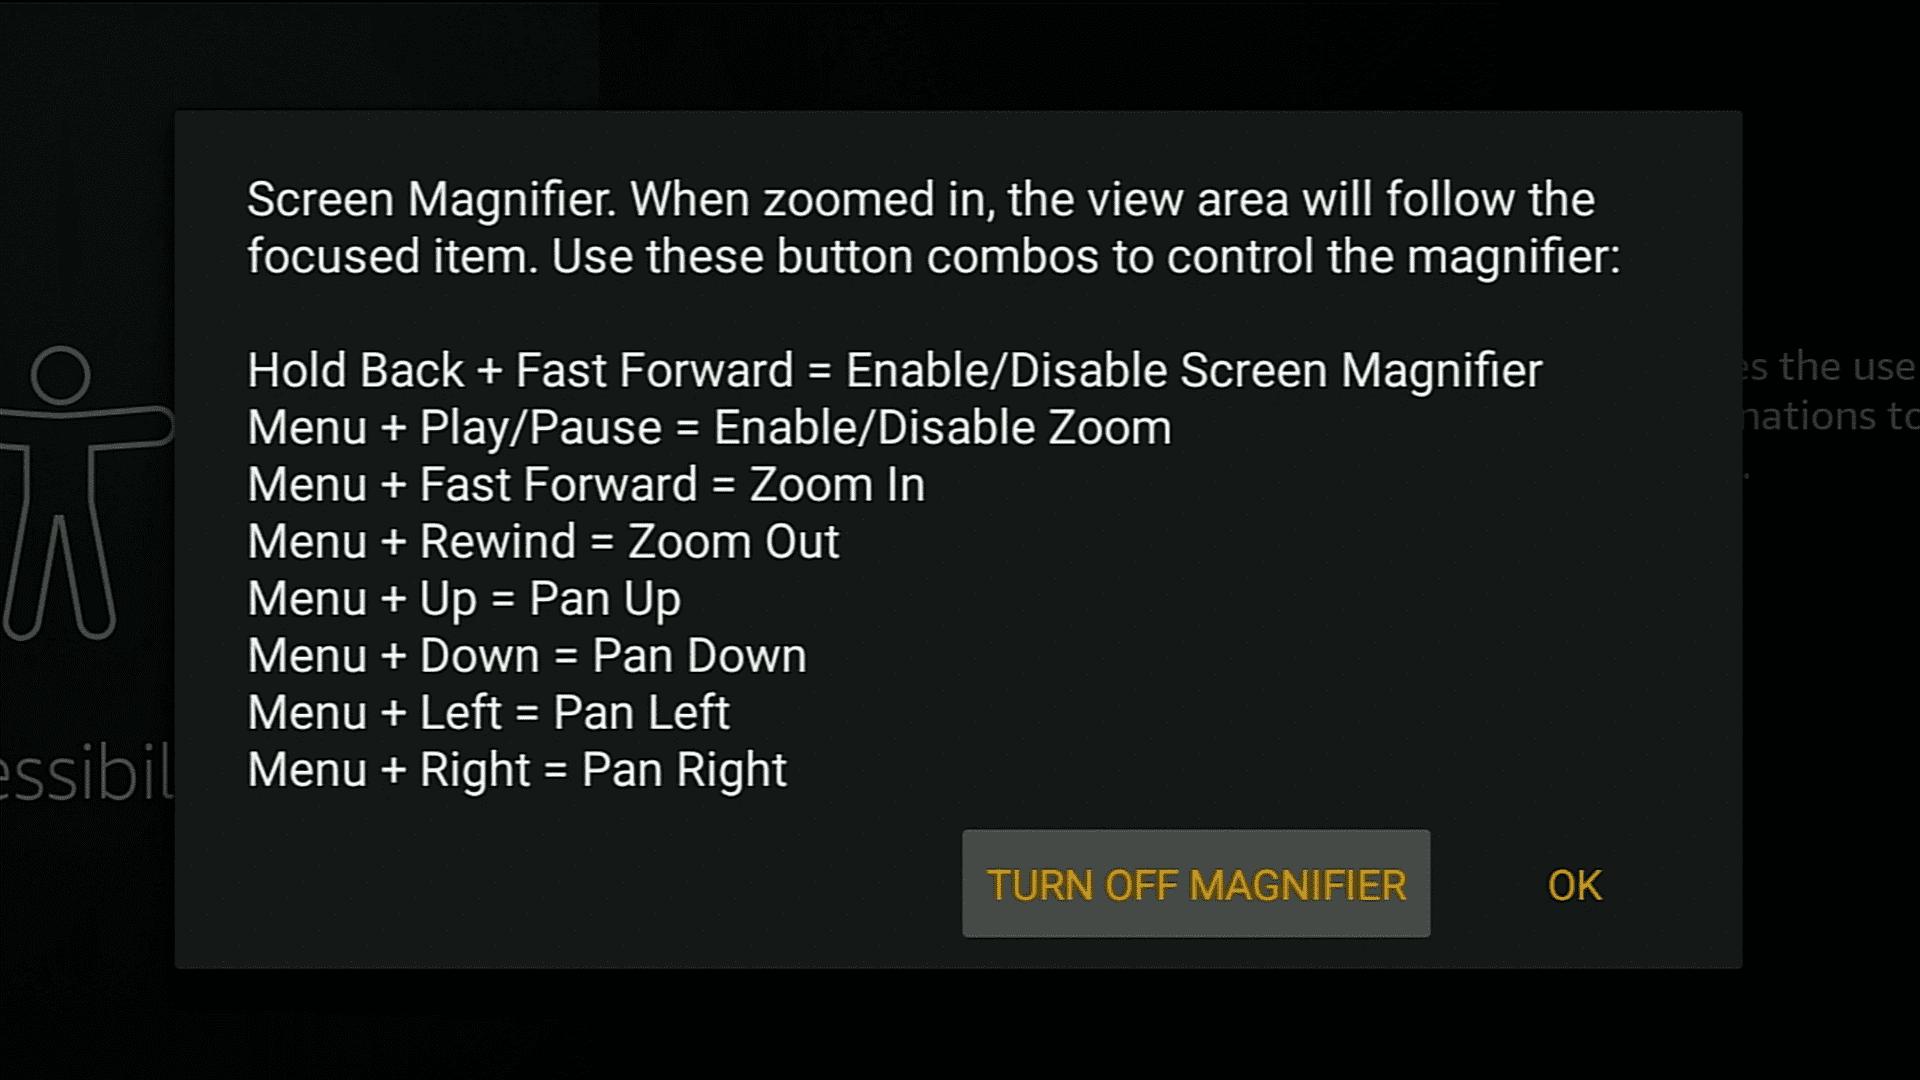 Turn On Screen magnifier on firestick